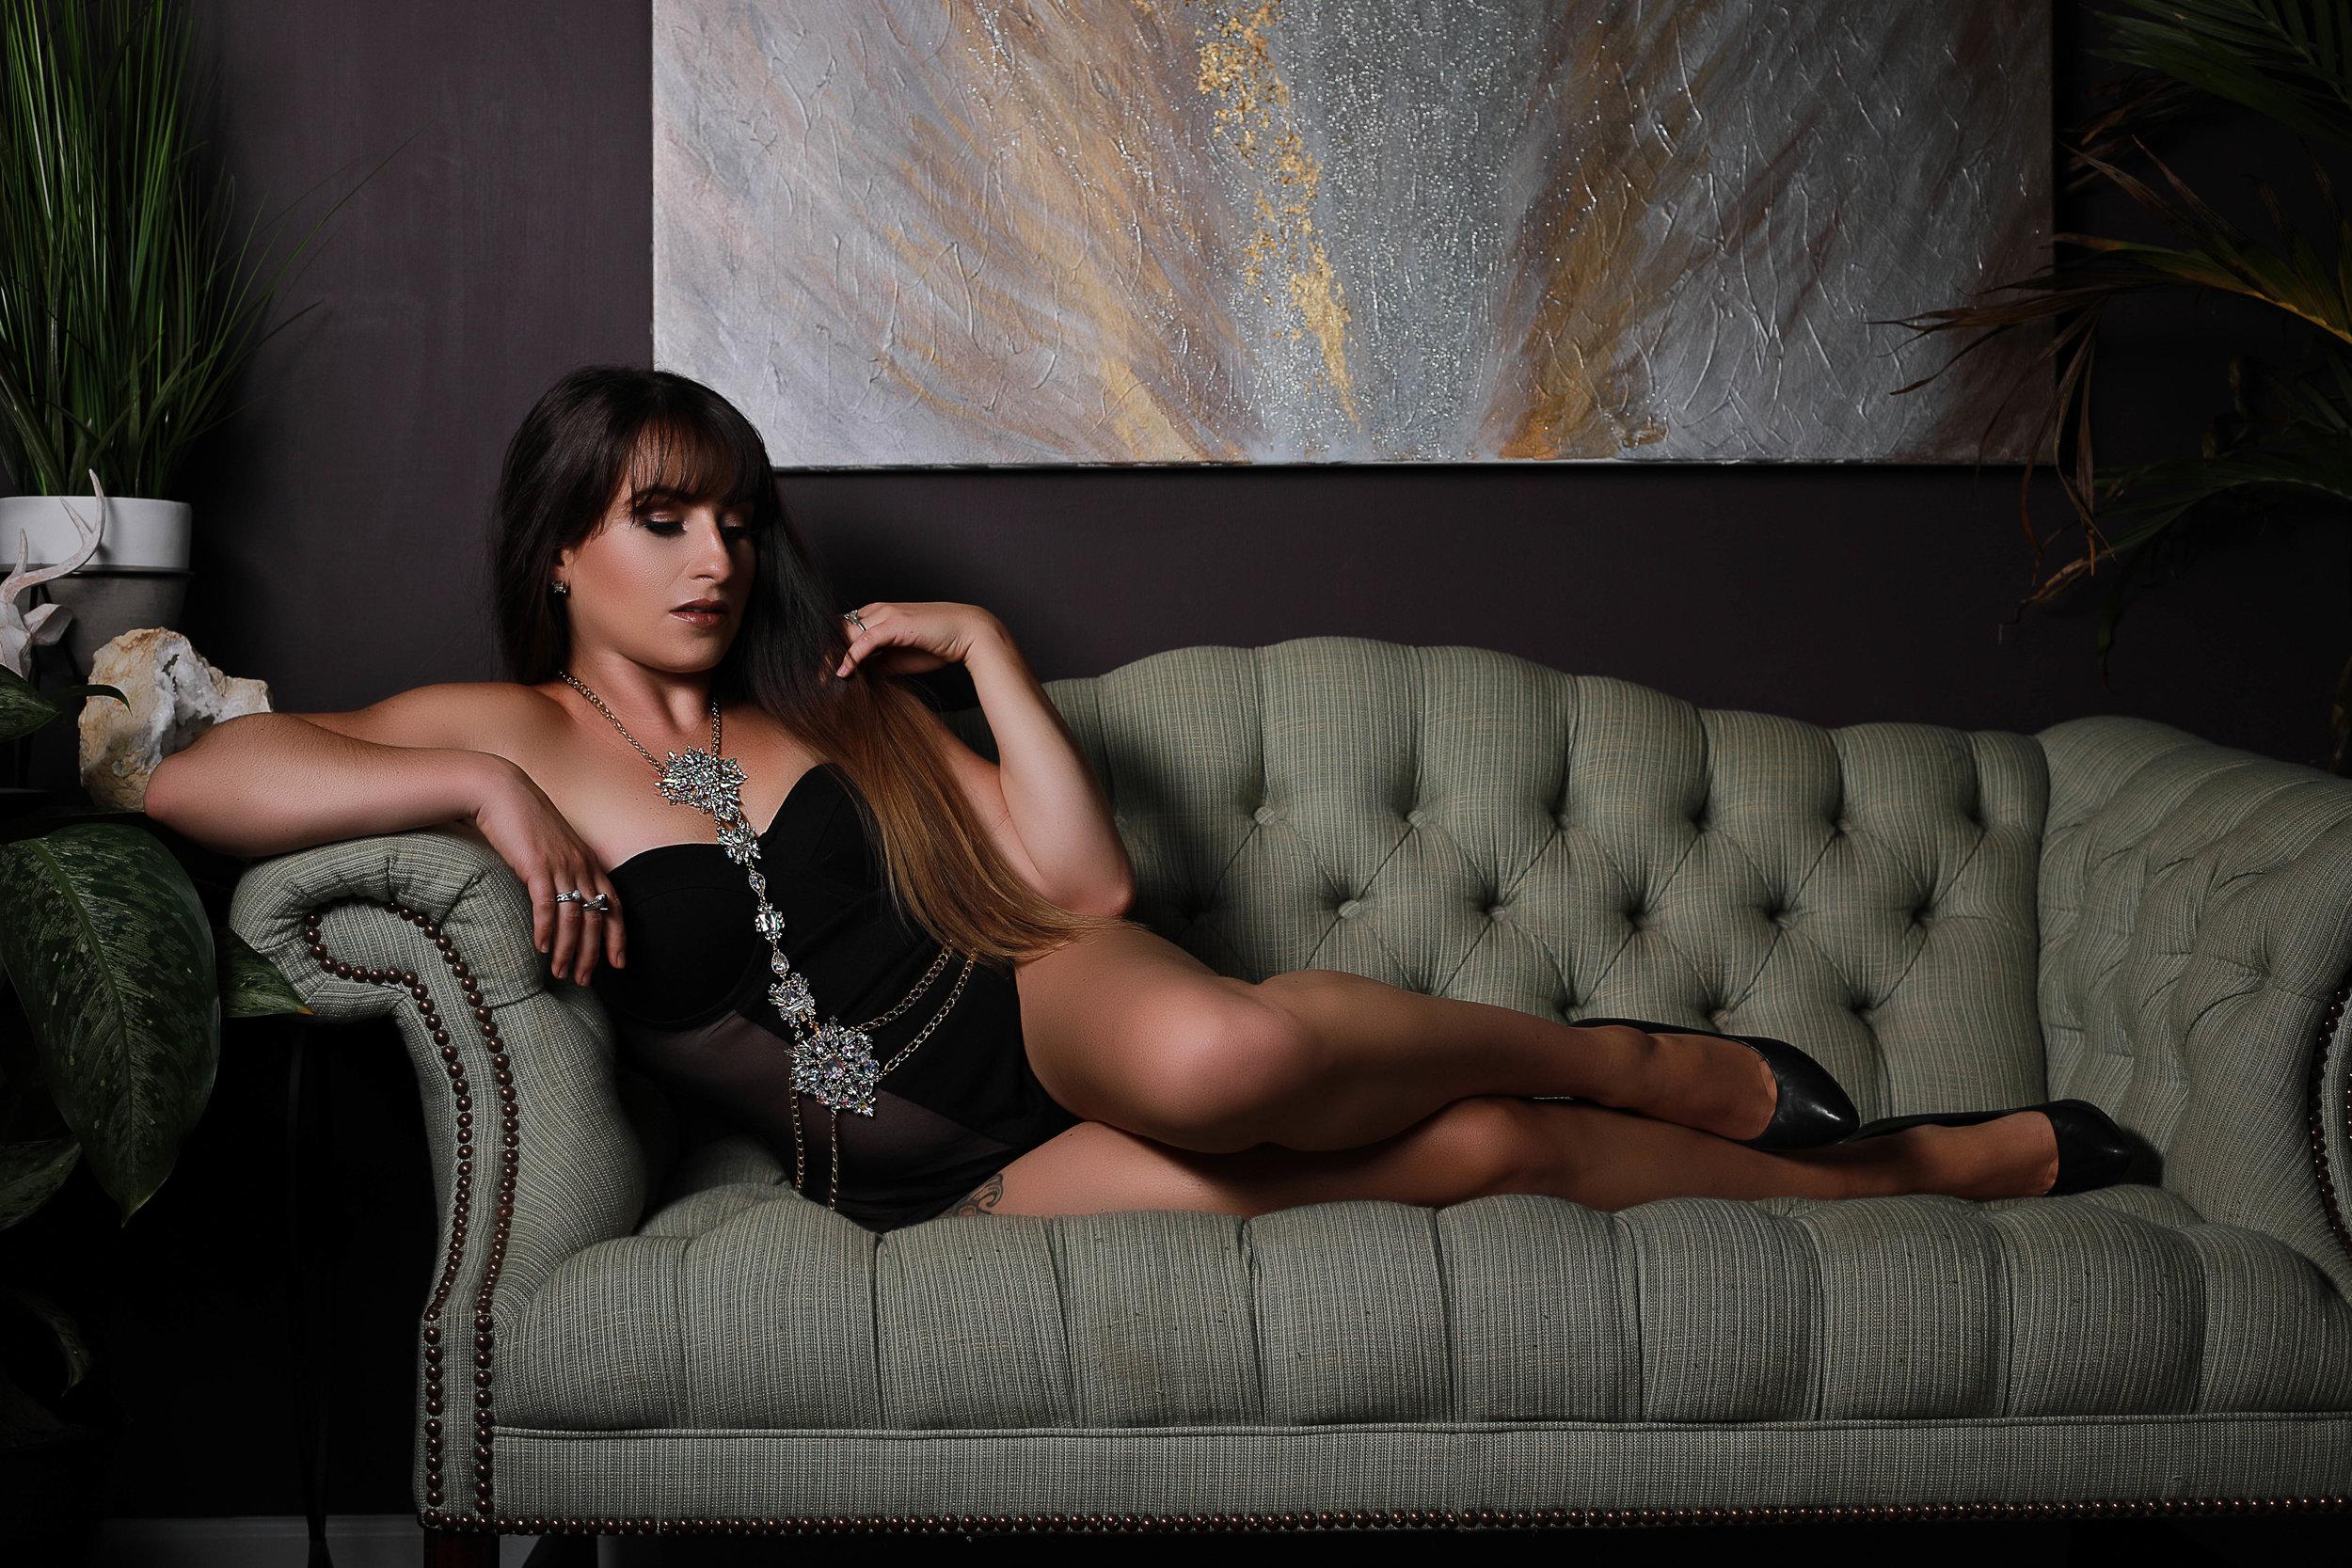 boudoir photography in maryland, DC, virginia